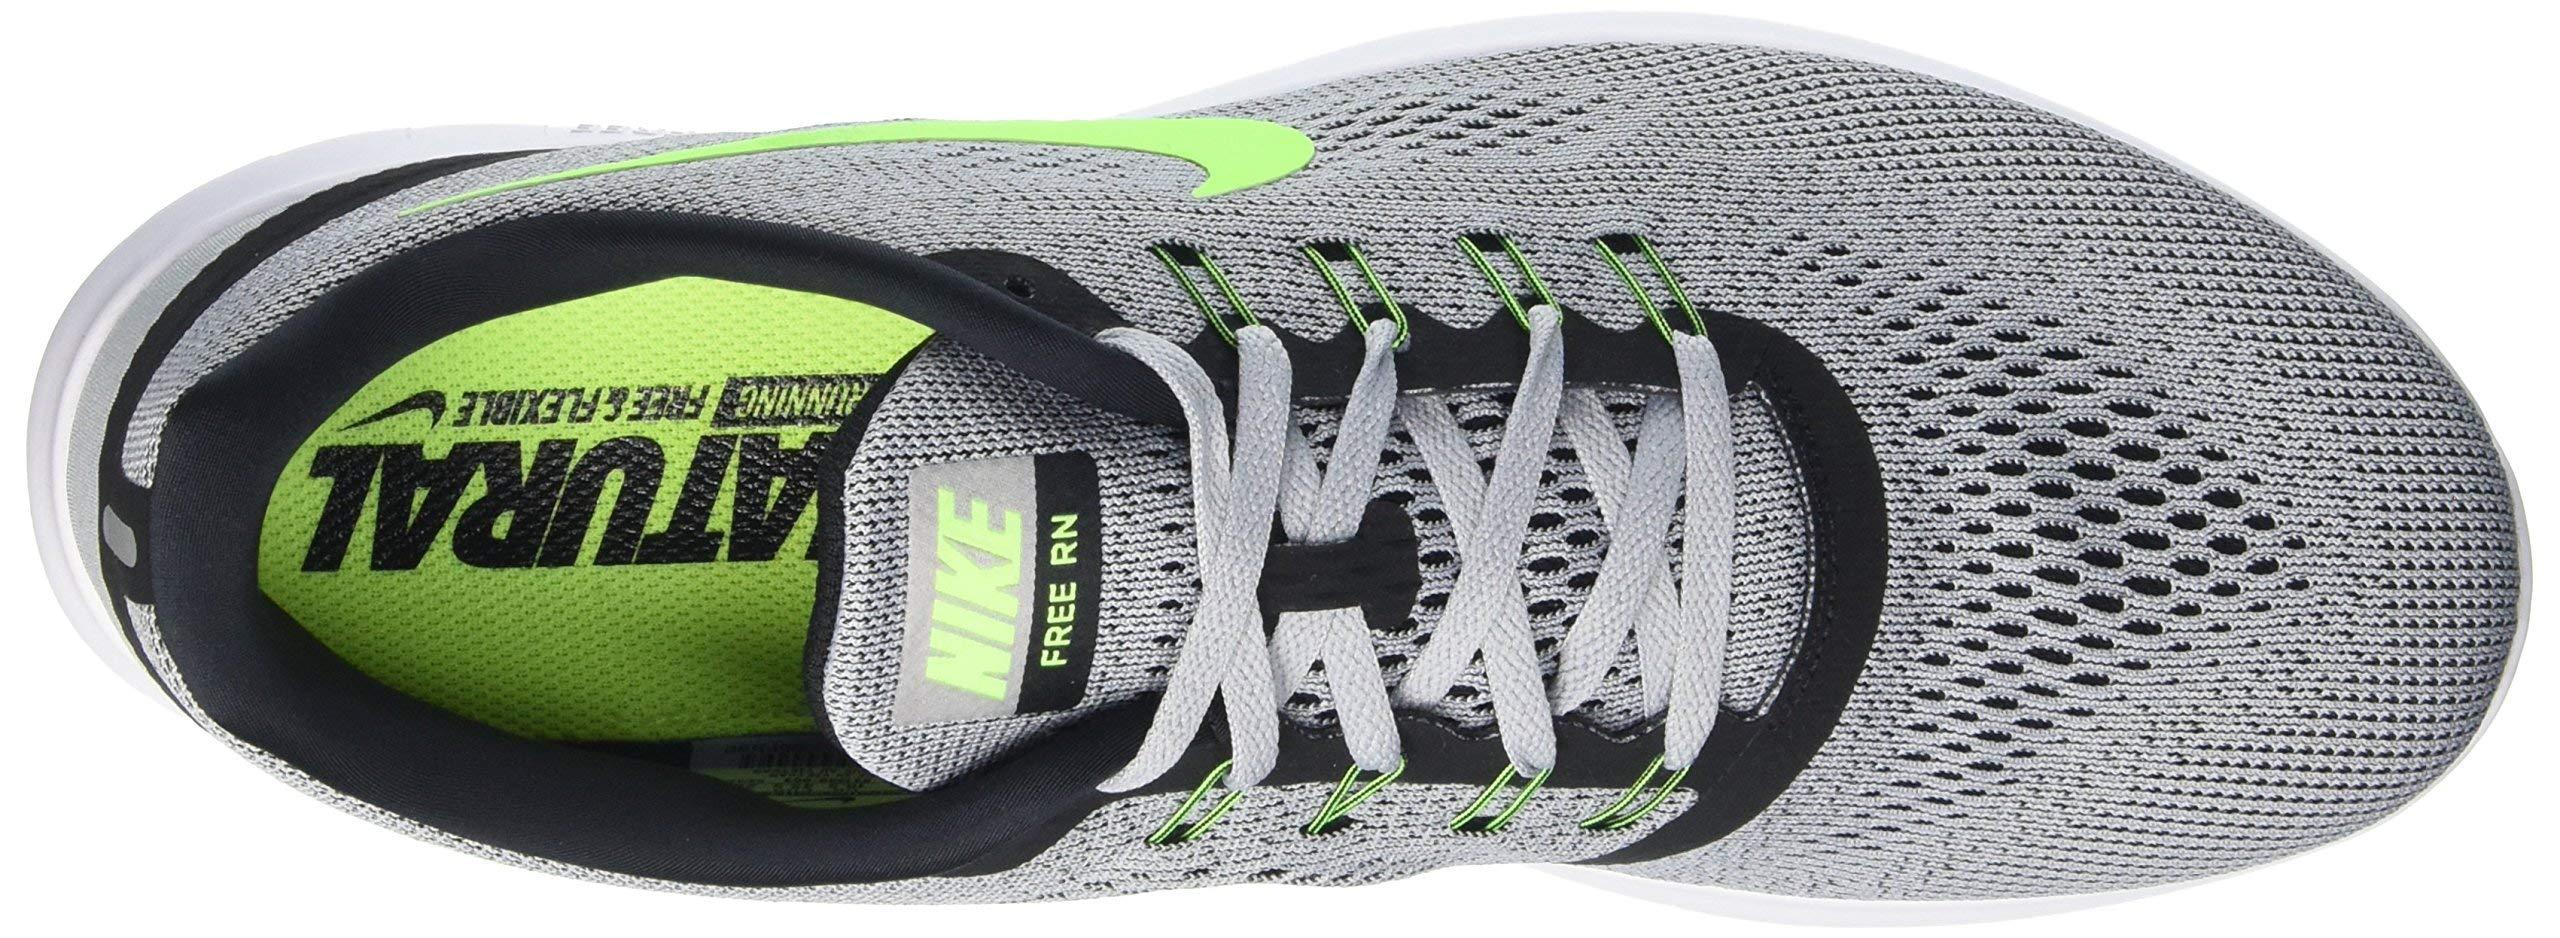 Nike Mens Free Rn Pure Platinum/Elctrc Grn/Anthracite Running Shoe 8 Men US by Nike (Image #6)